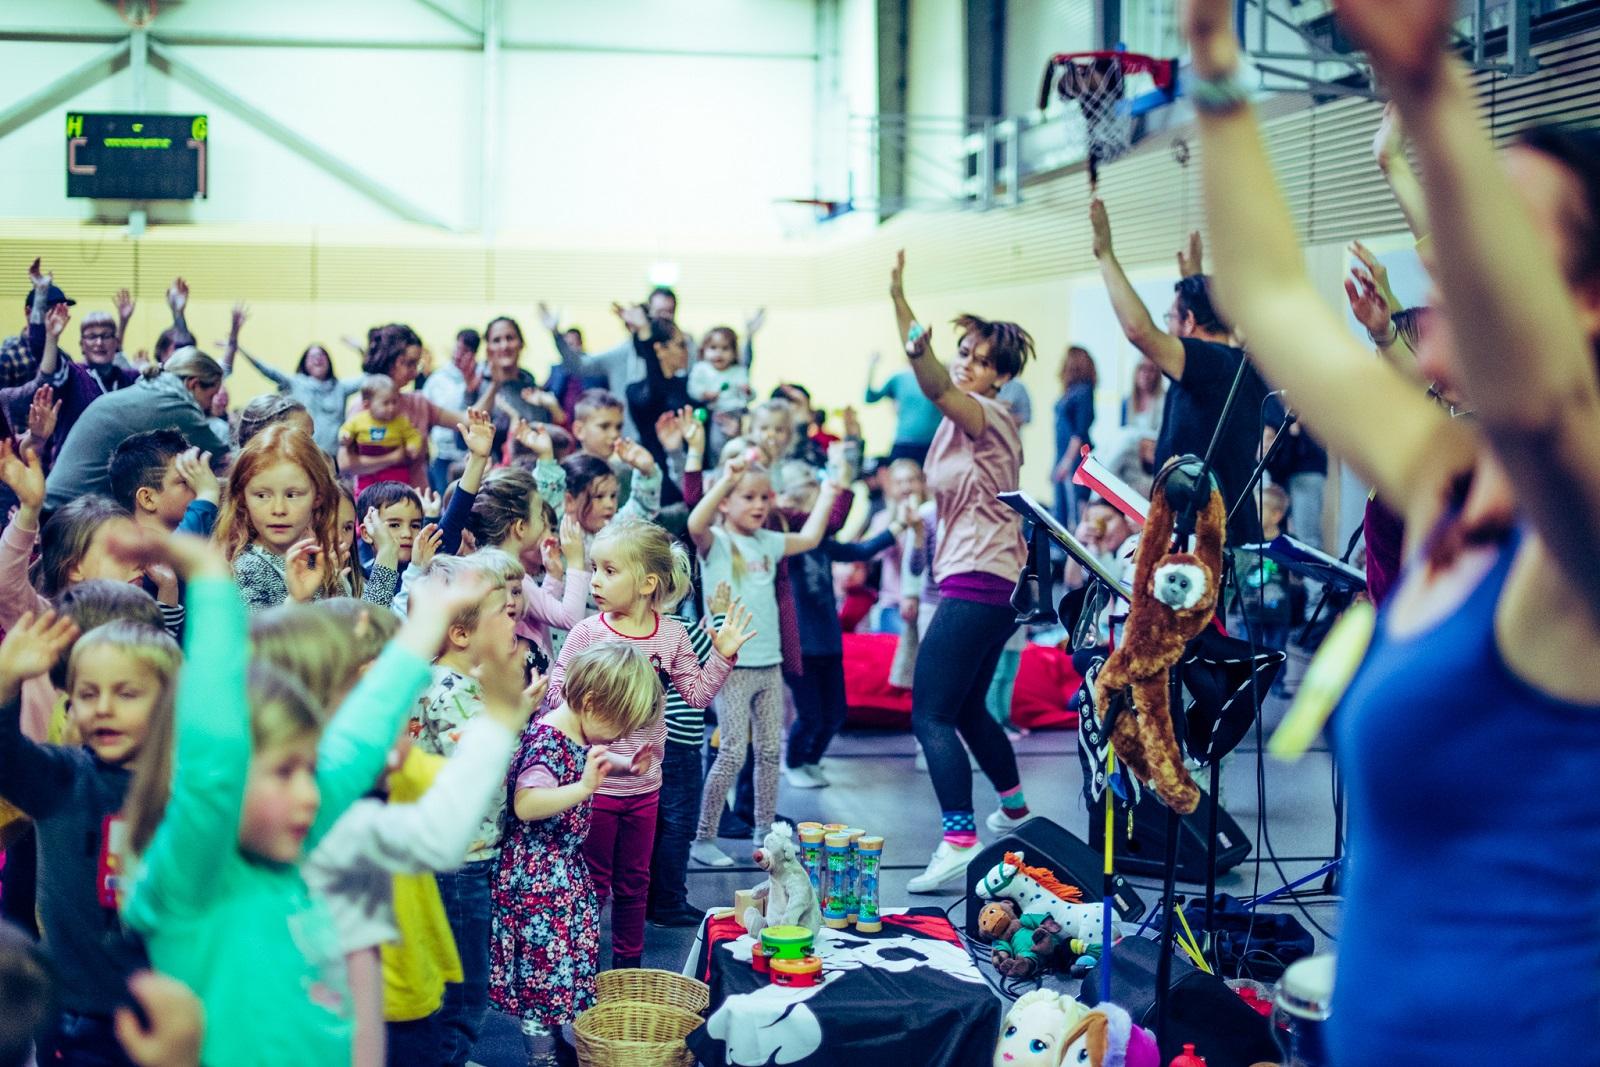 Kindermitmachkonzert BasKIDhall 2019